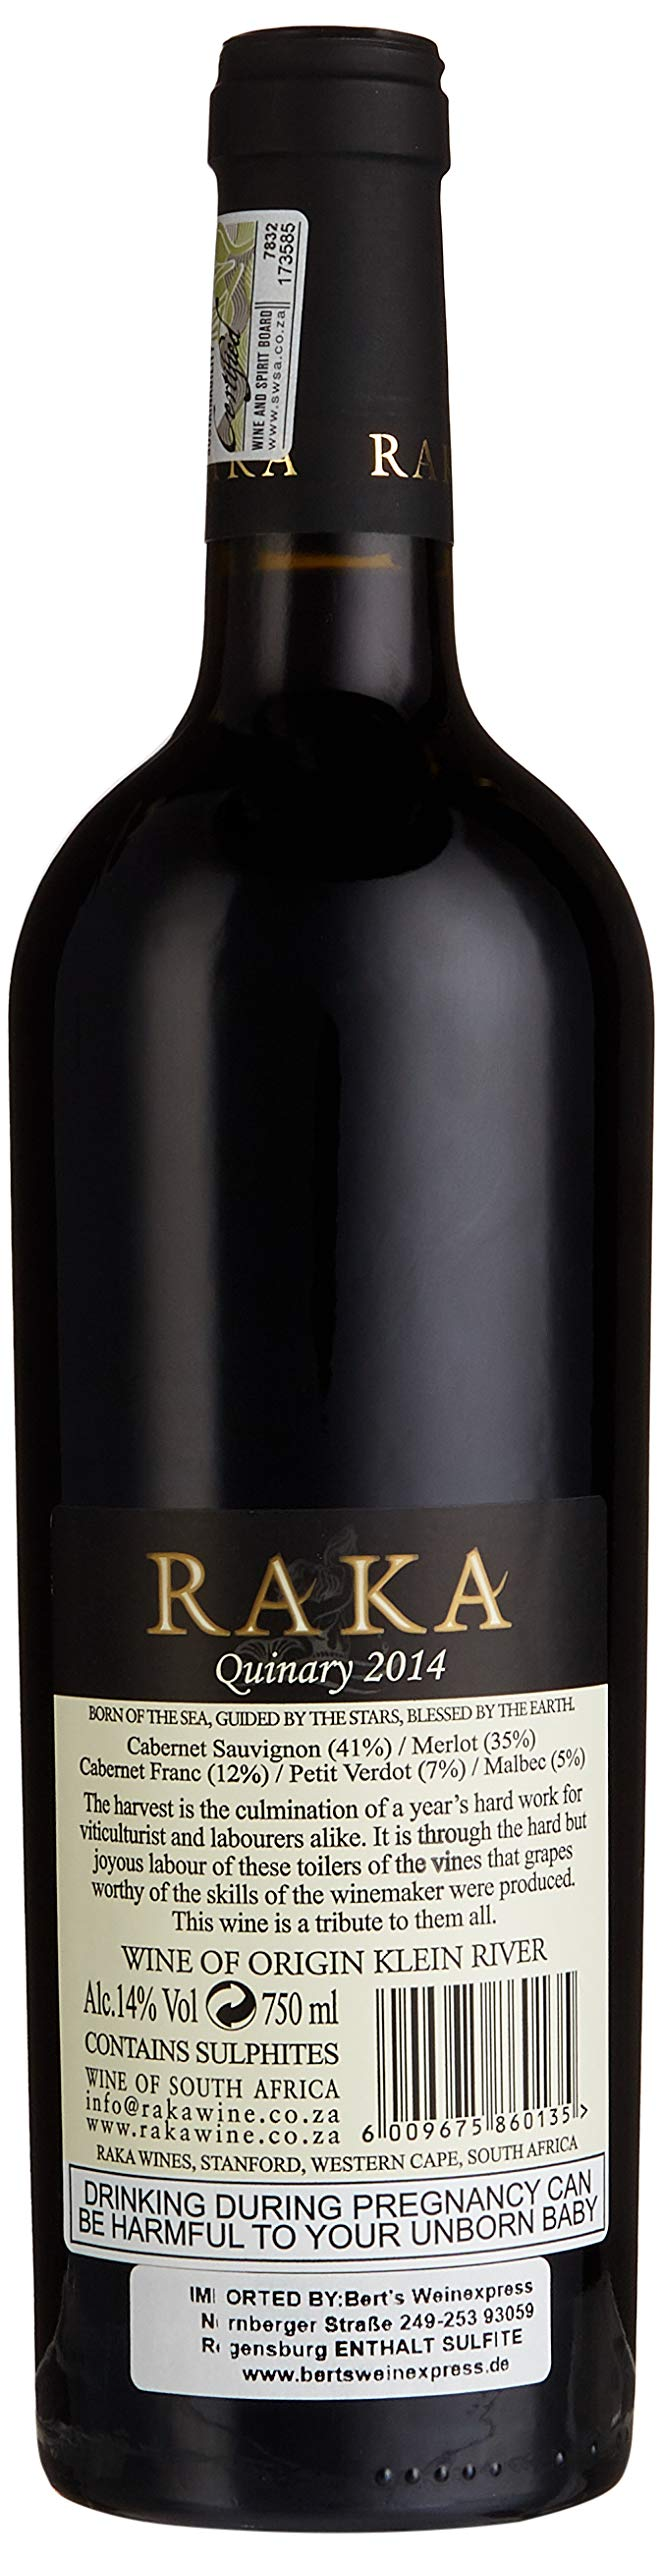 Raka-Quinary-Cabernet-Sauvignon-2014-trocken-3-x-075-l